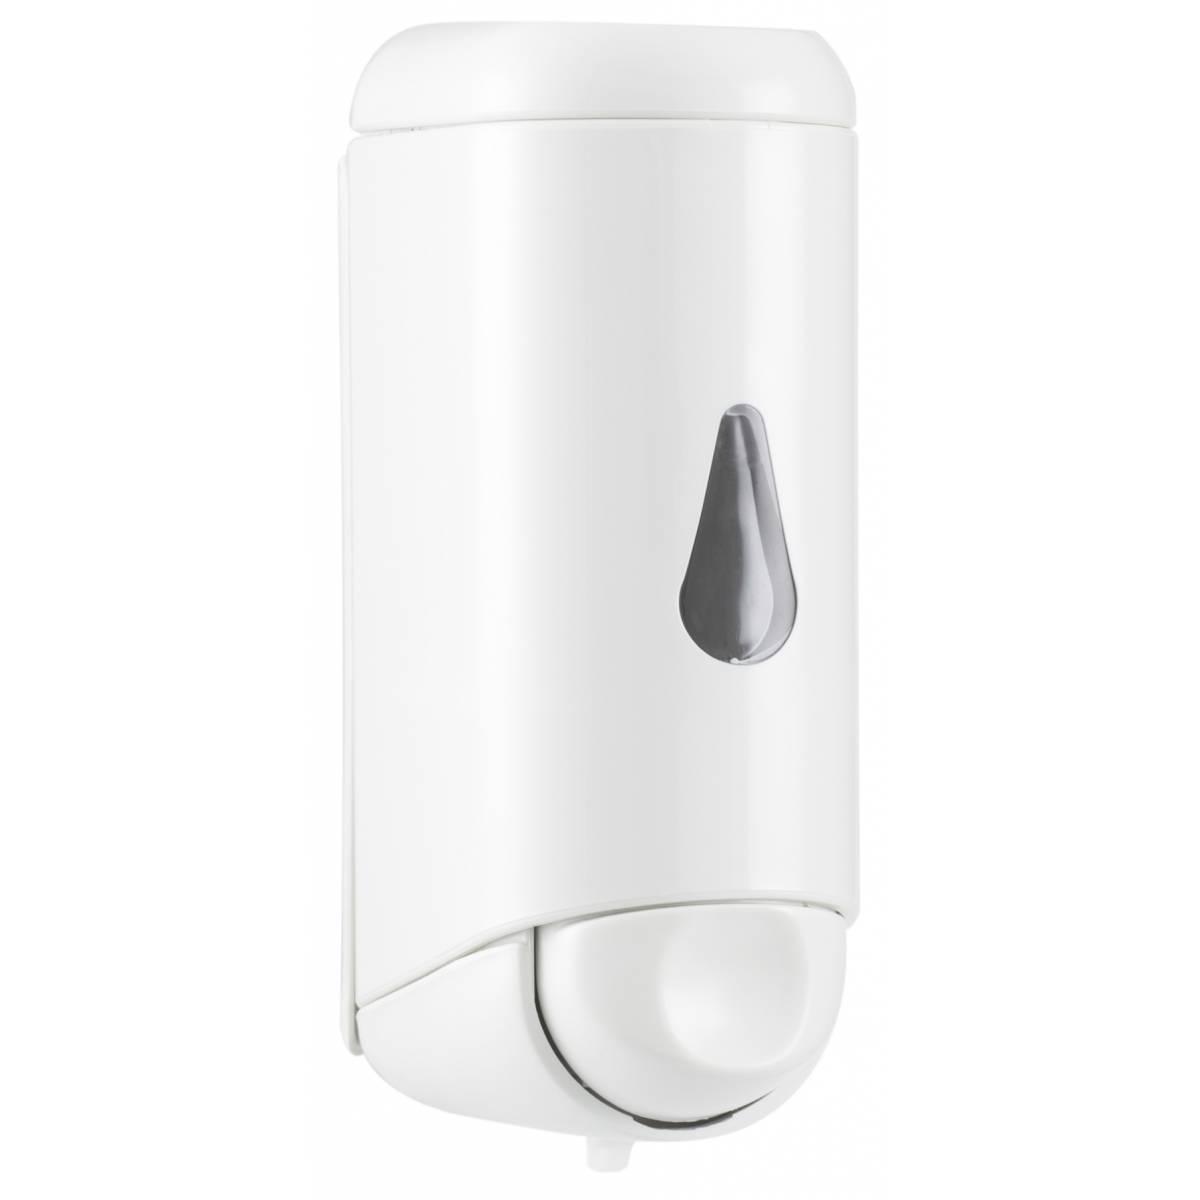 Дозатор жидкого мыла Mar Plast 0,17 л ACQUALBA (583WIN) A58311WIN Mar Plast